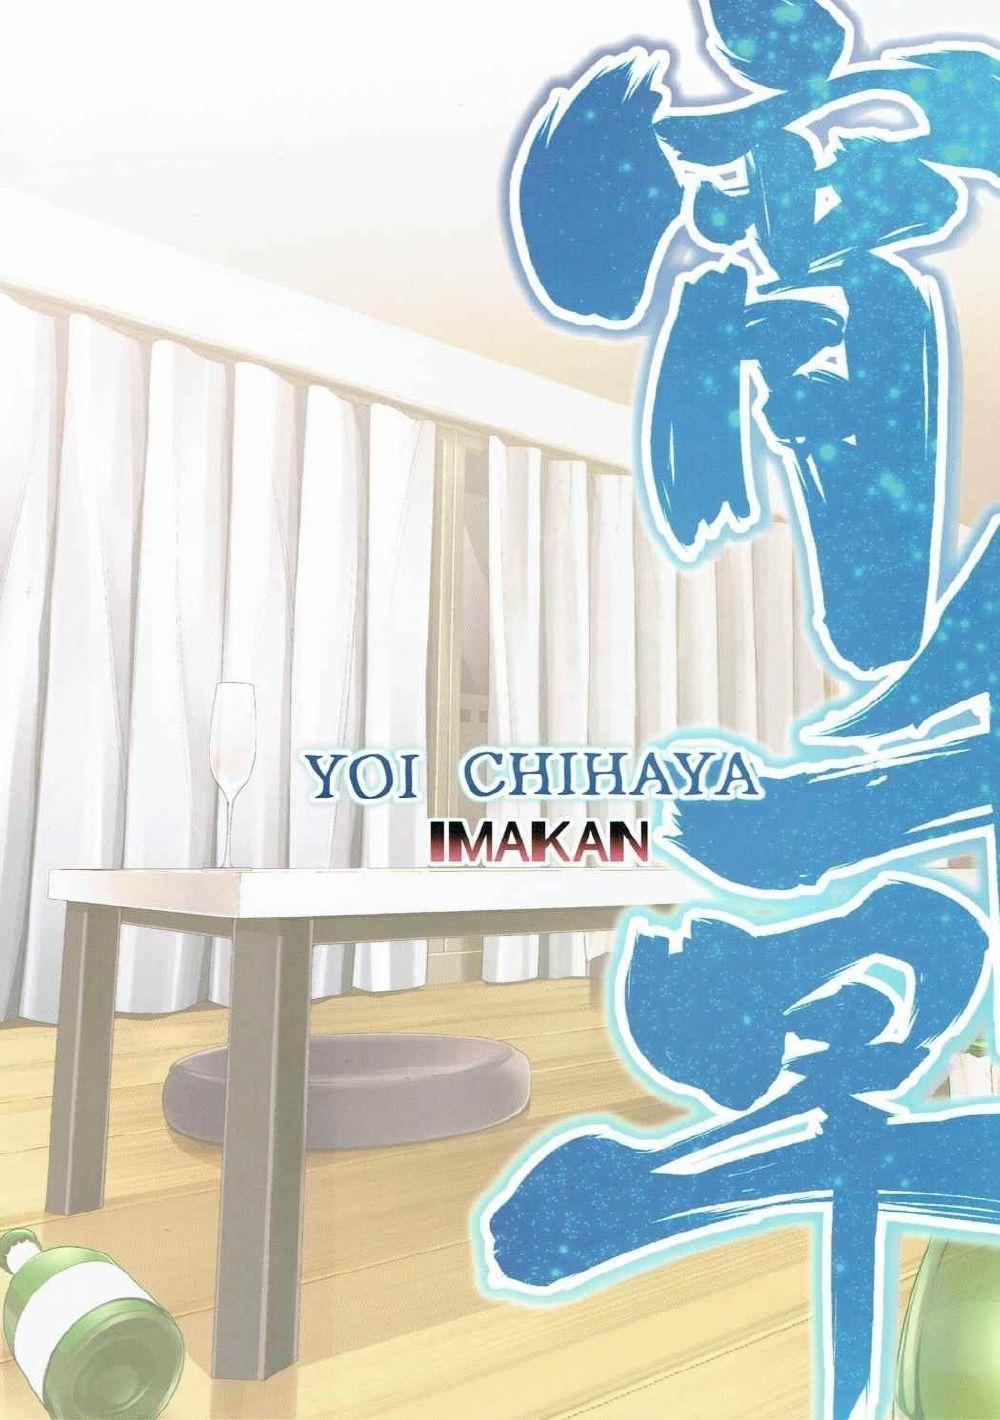 Yoi Chihaya + 37